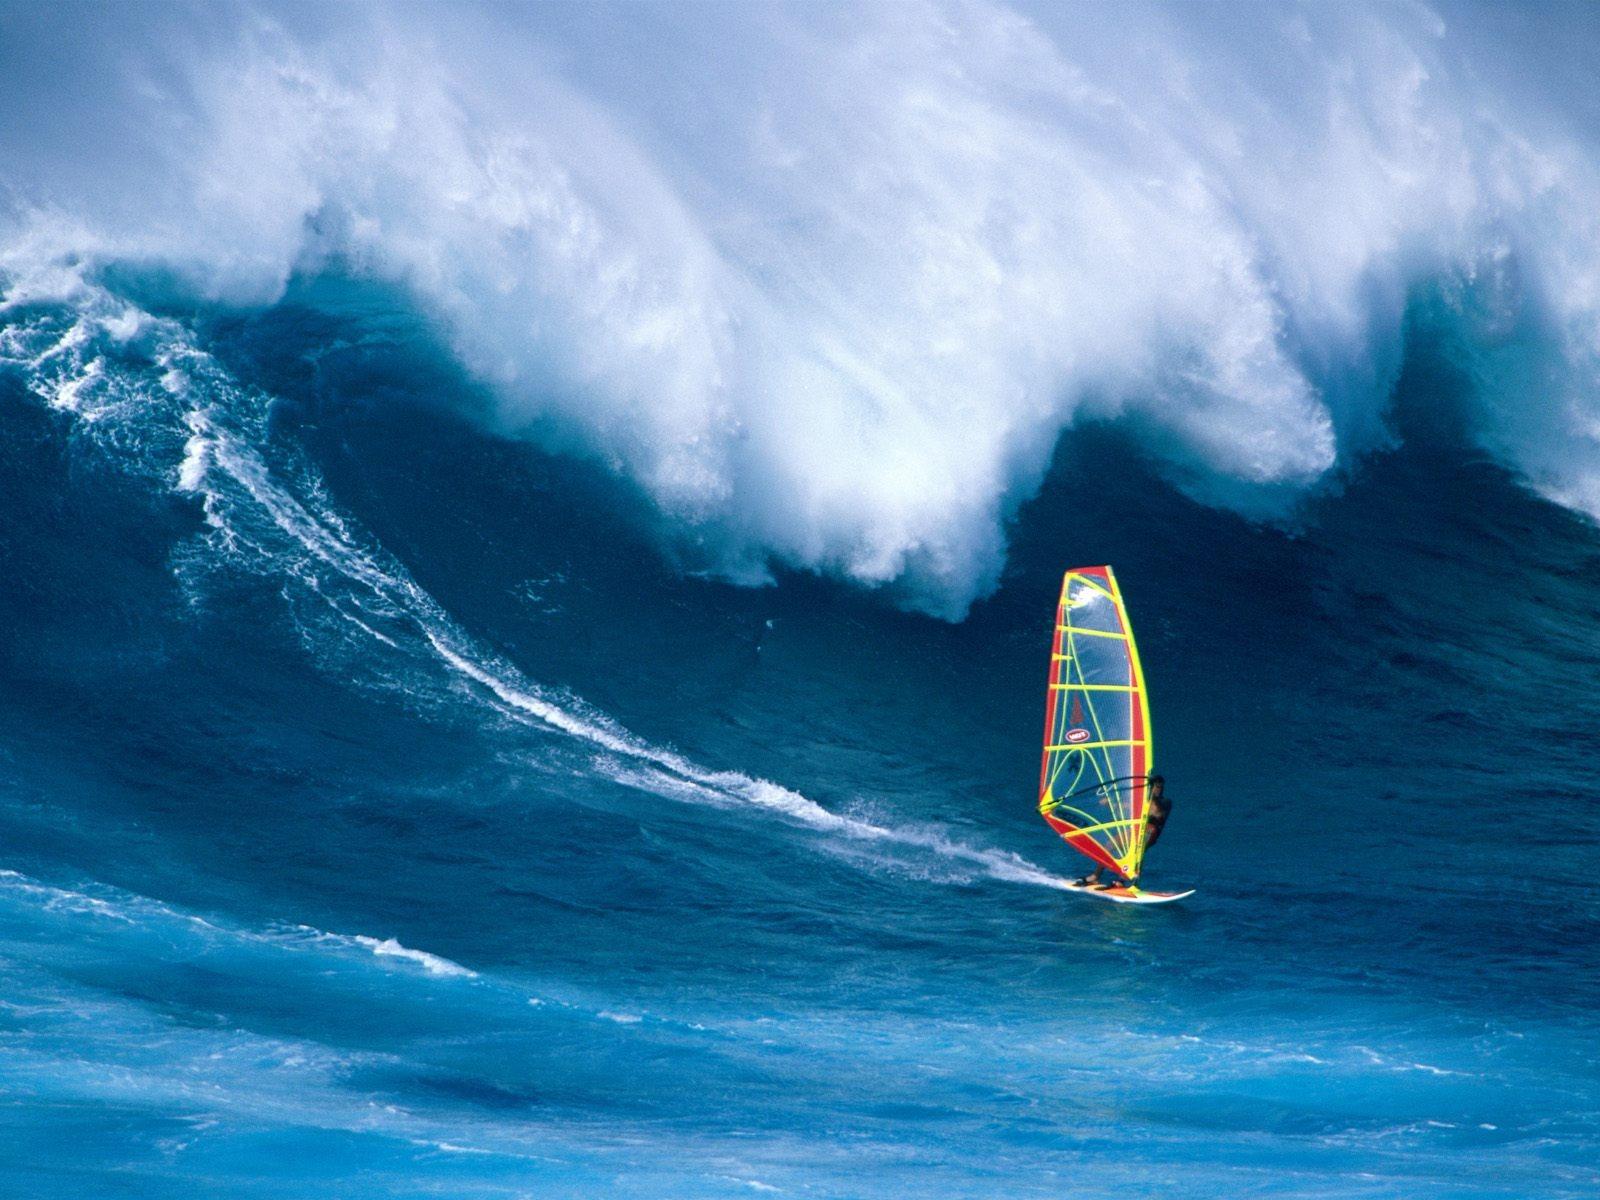 Outdoor Sports Wallpaper 24 Wallpapers: 帆板冲浪-户外运动壁纸-第二辑预览